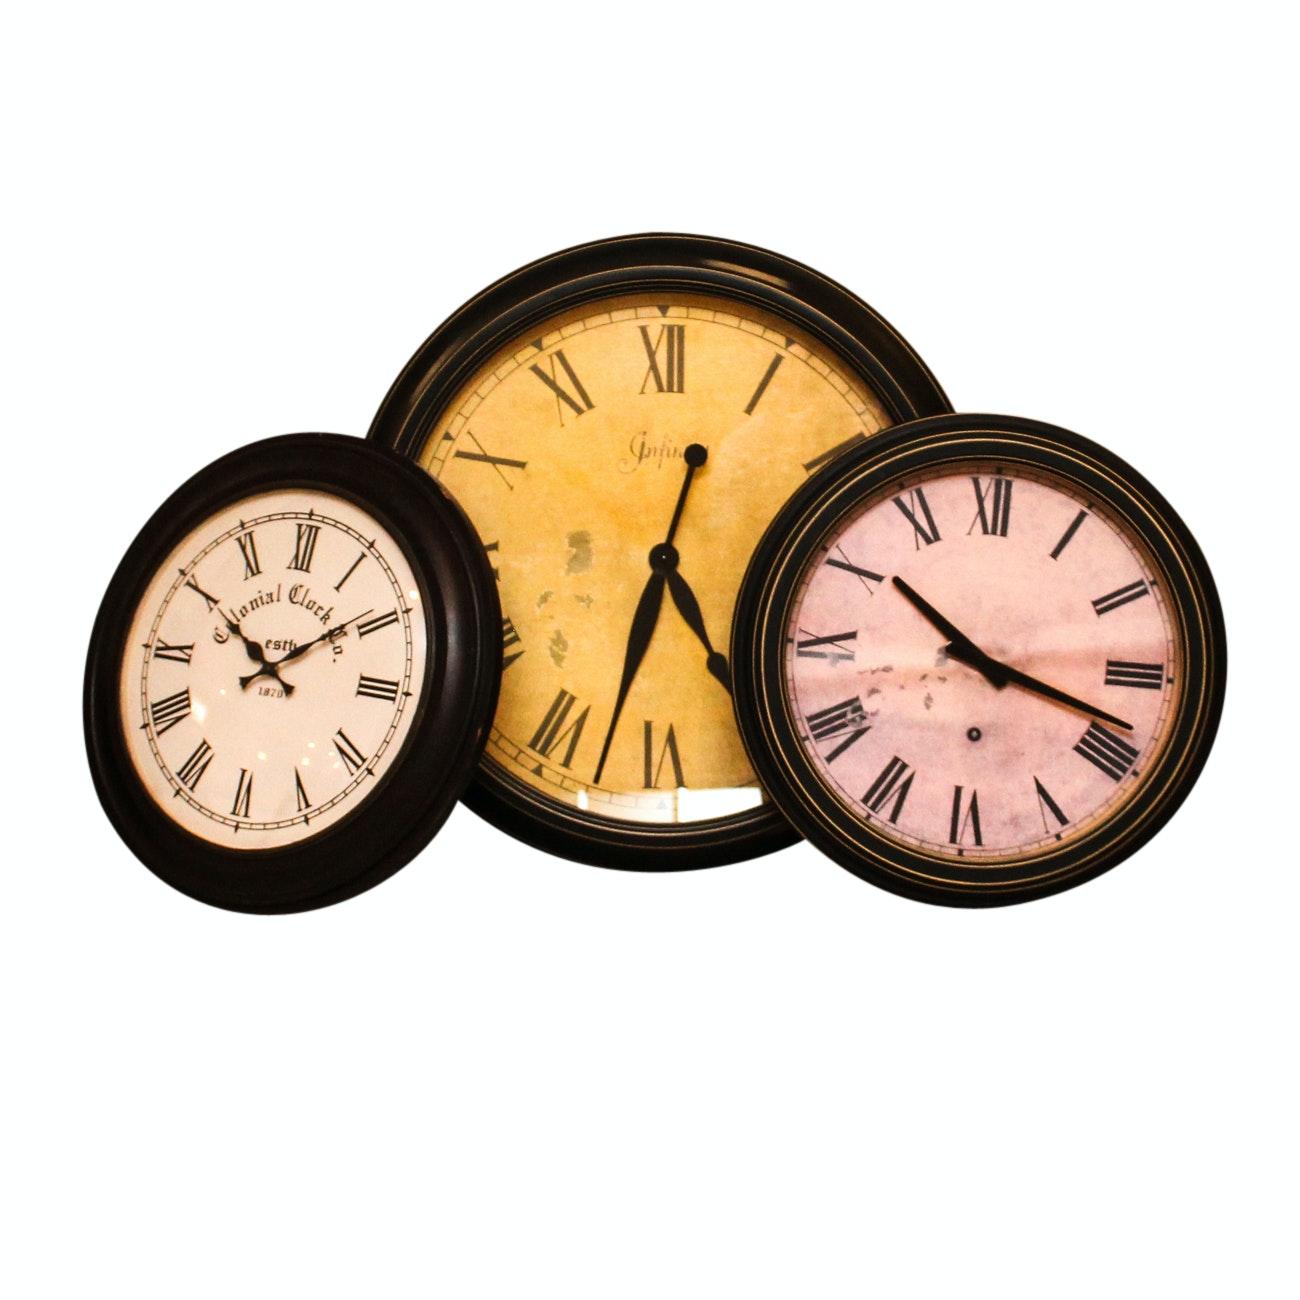 Grouping of Wall Clocks